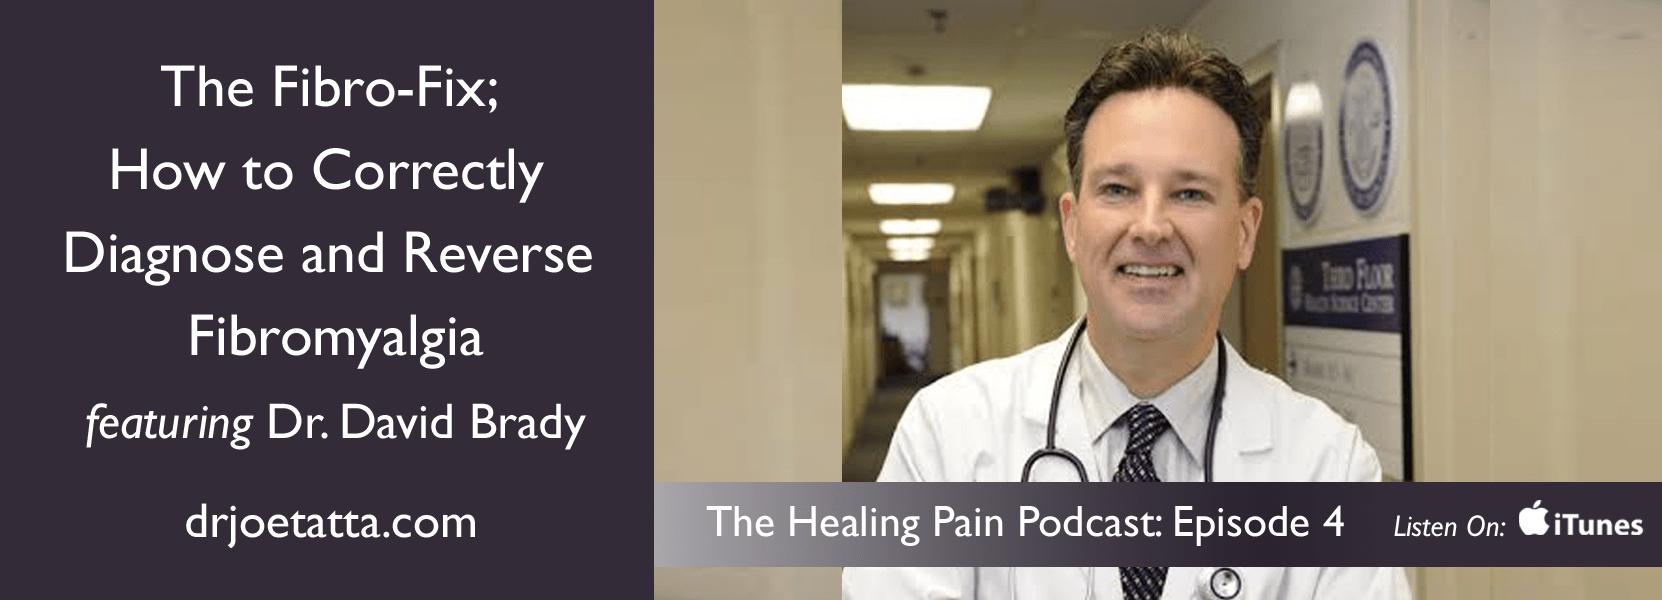 Dr-David-Brady-The-Fibro-Fix-Episode-4